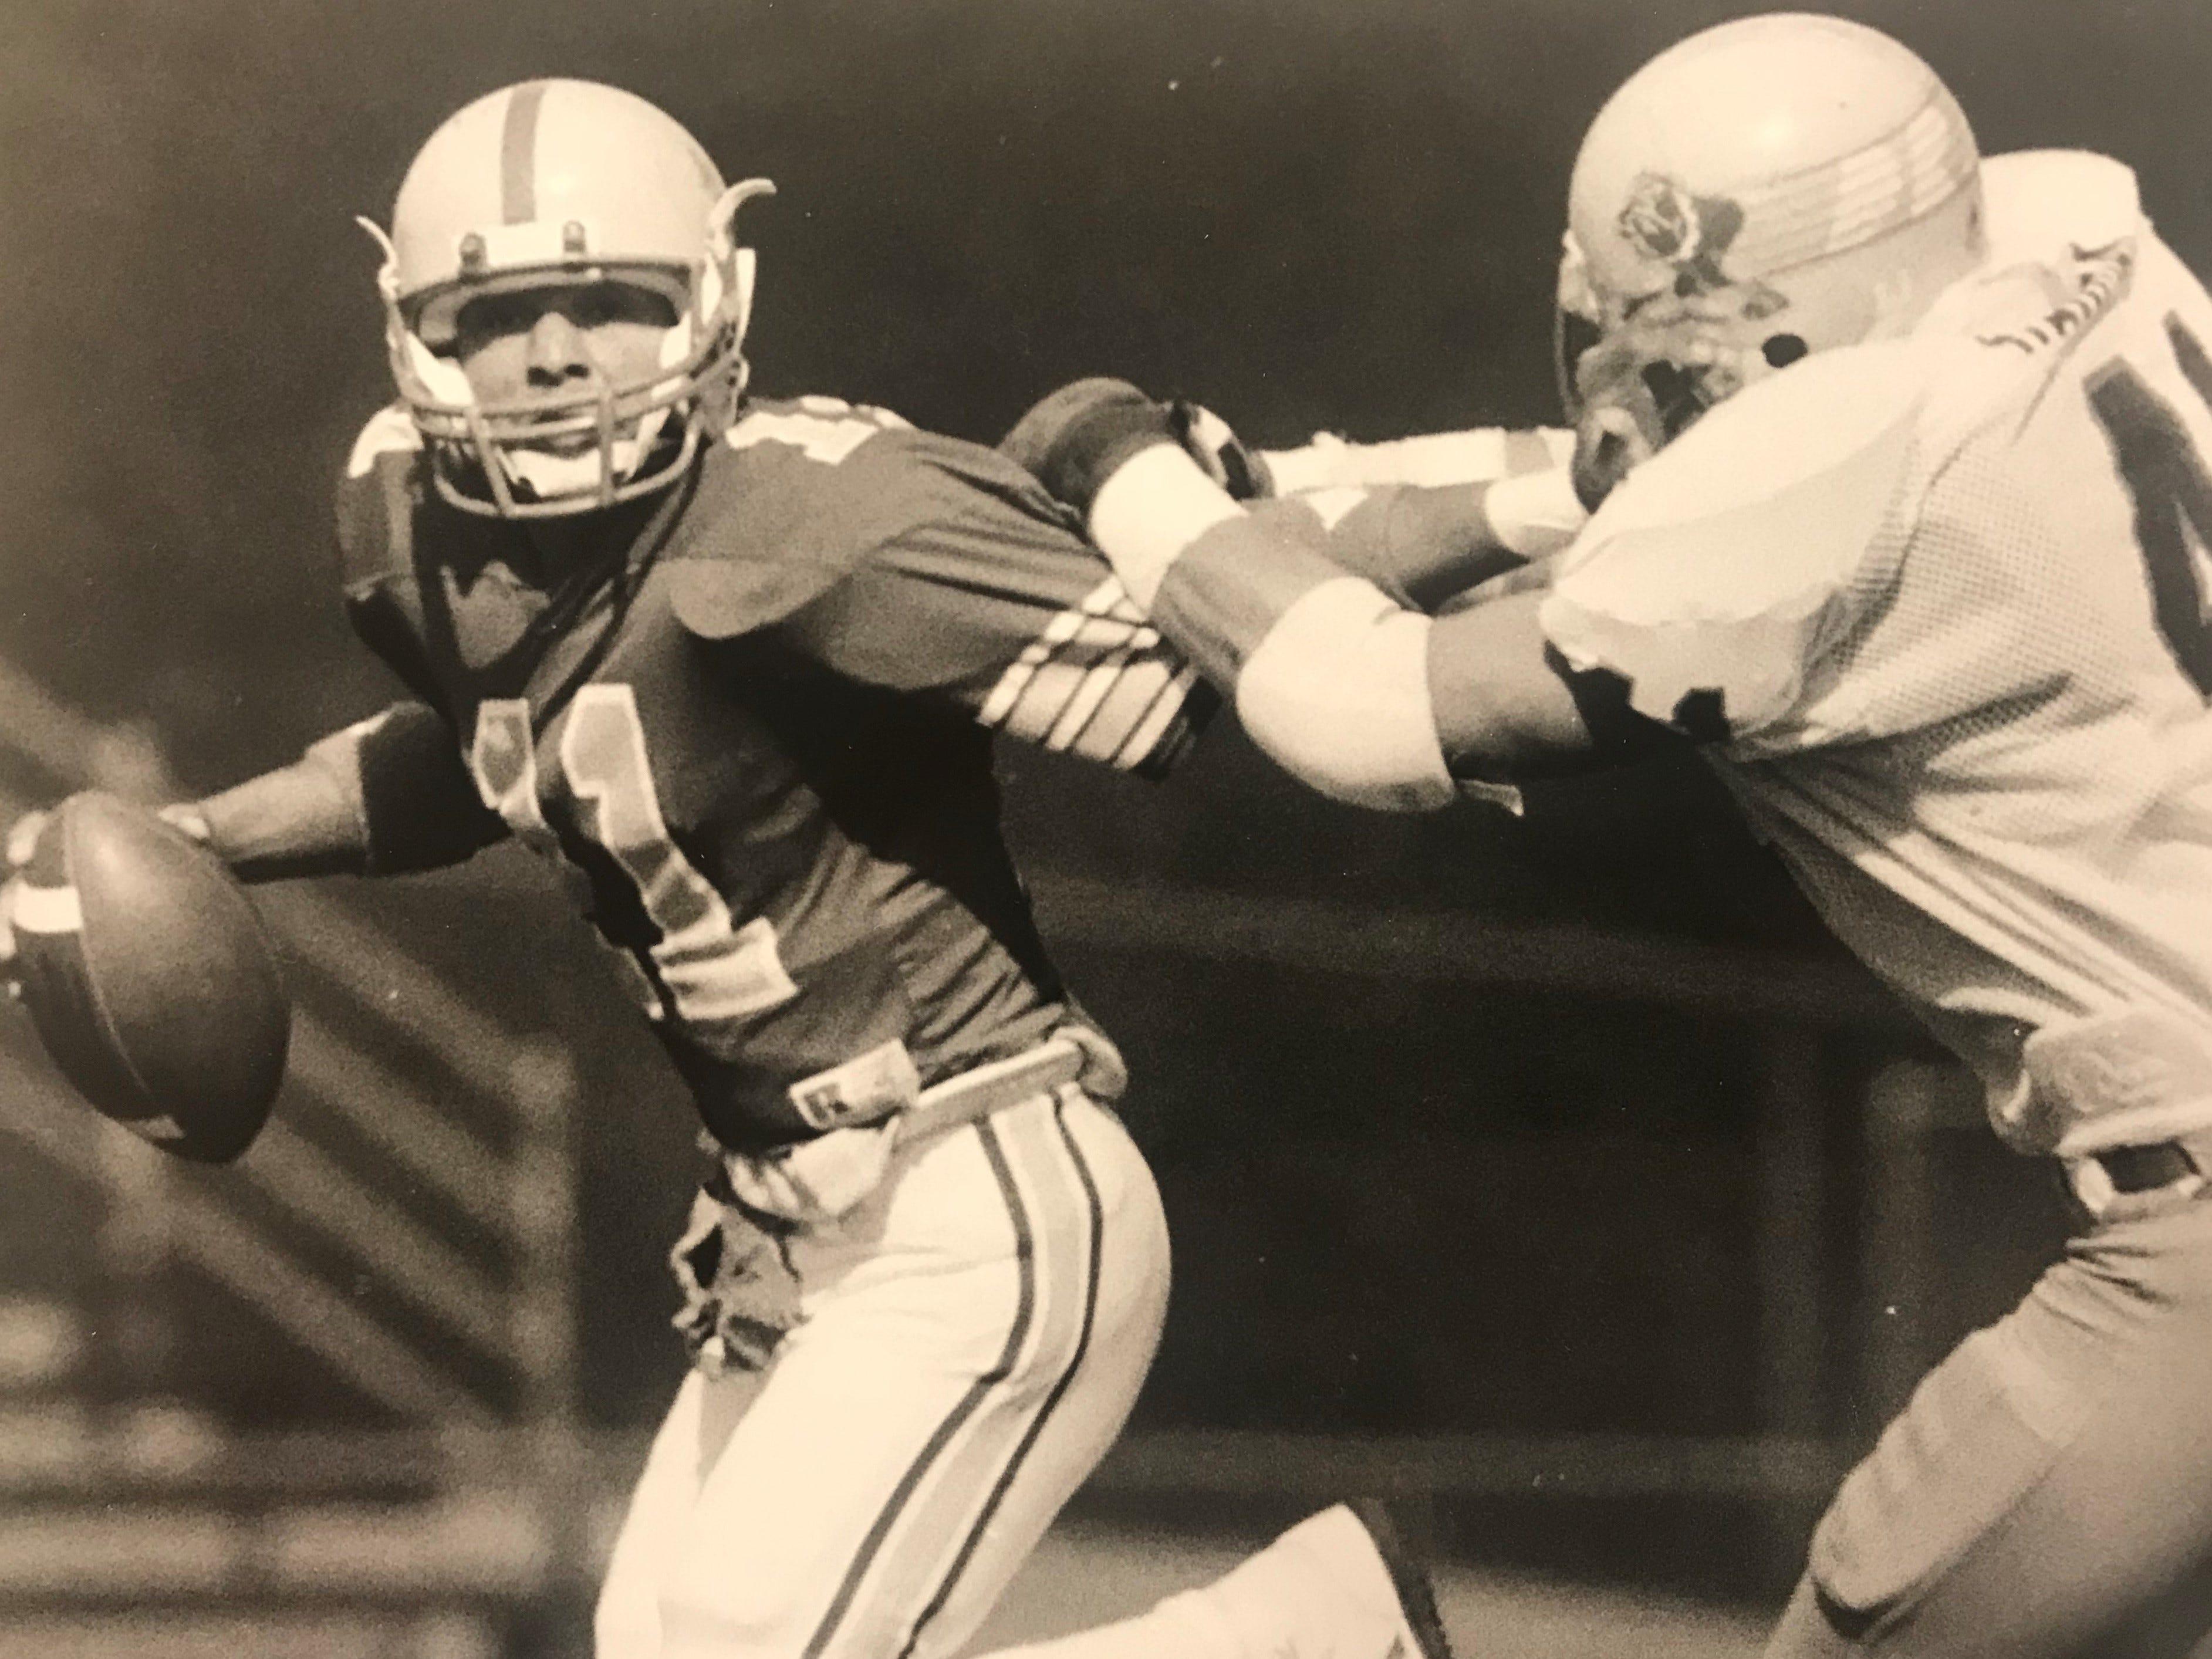 From 1985: Iowa State quarterback Alex Espinoza tries to elude Darke's Wade Harman during the Bulldogs' 20-17 win Oct. 5, 1985.